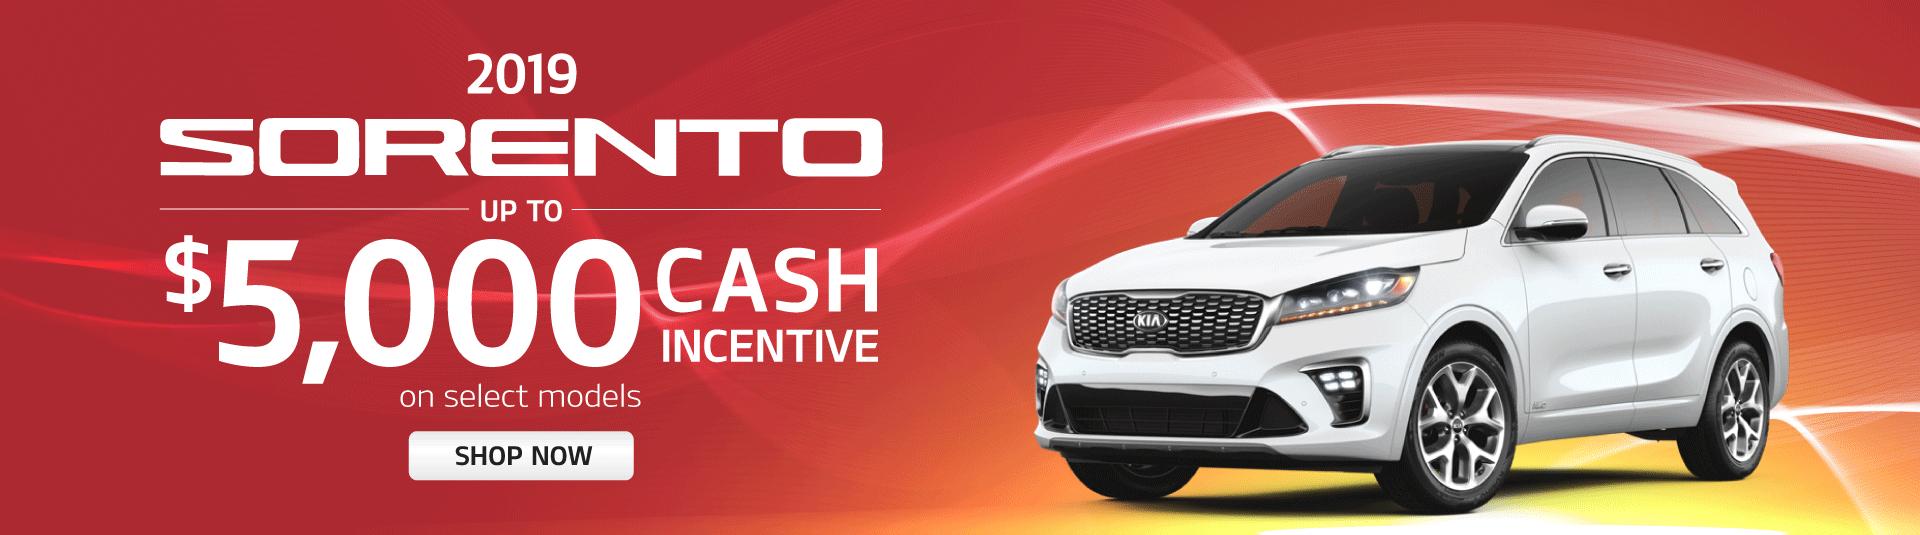 2019 Sorento 5,000 Cash Incentive Mississauga Kia